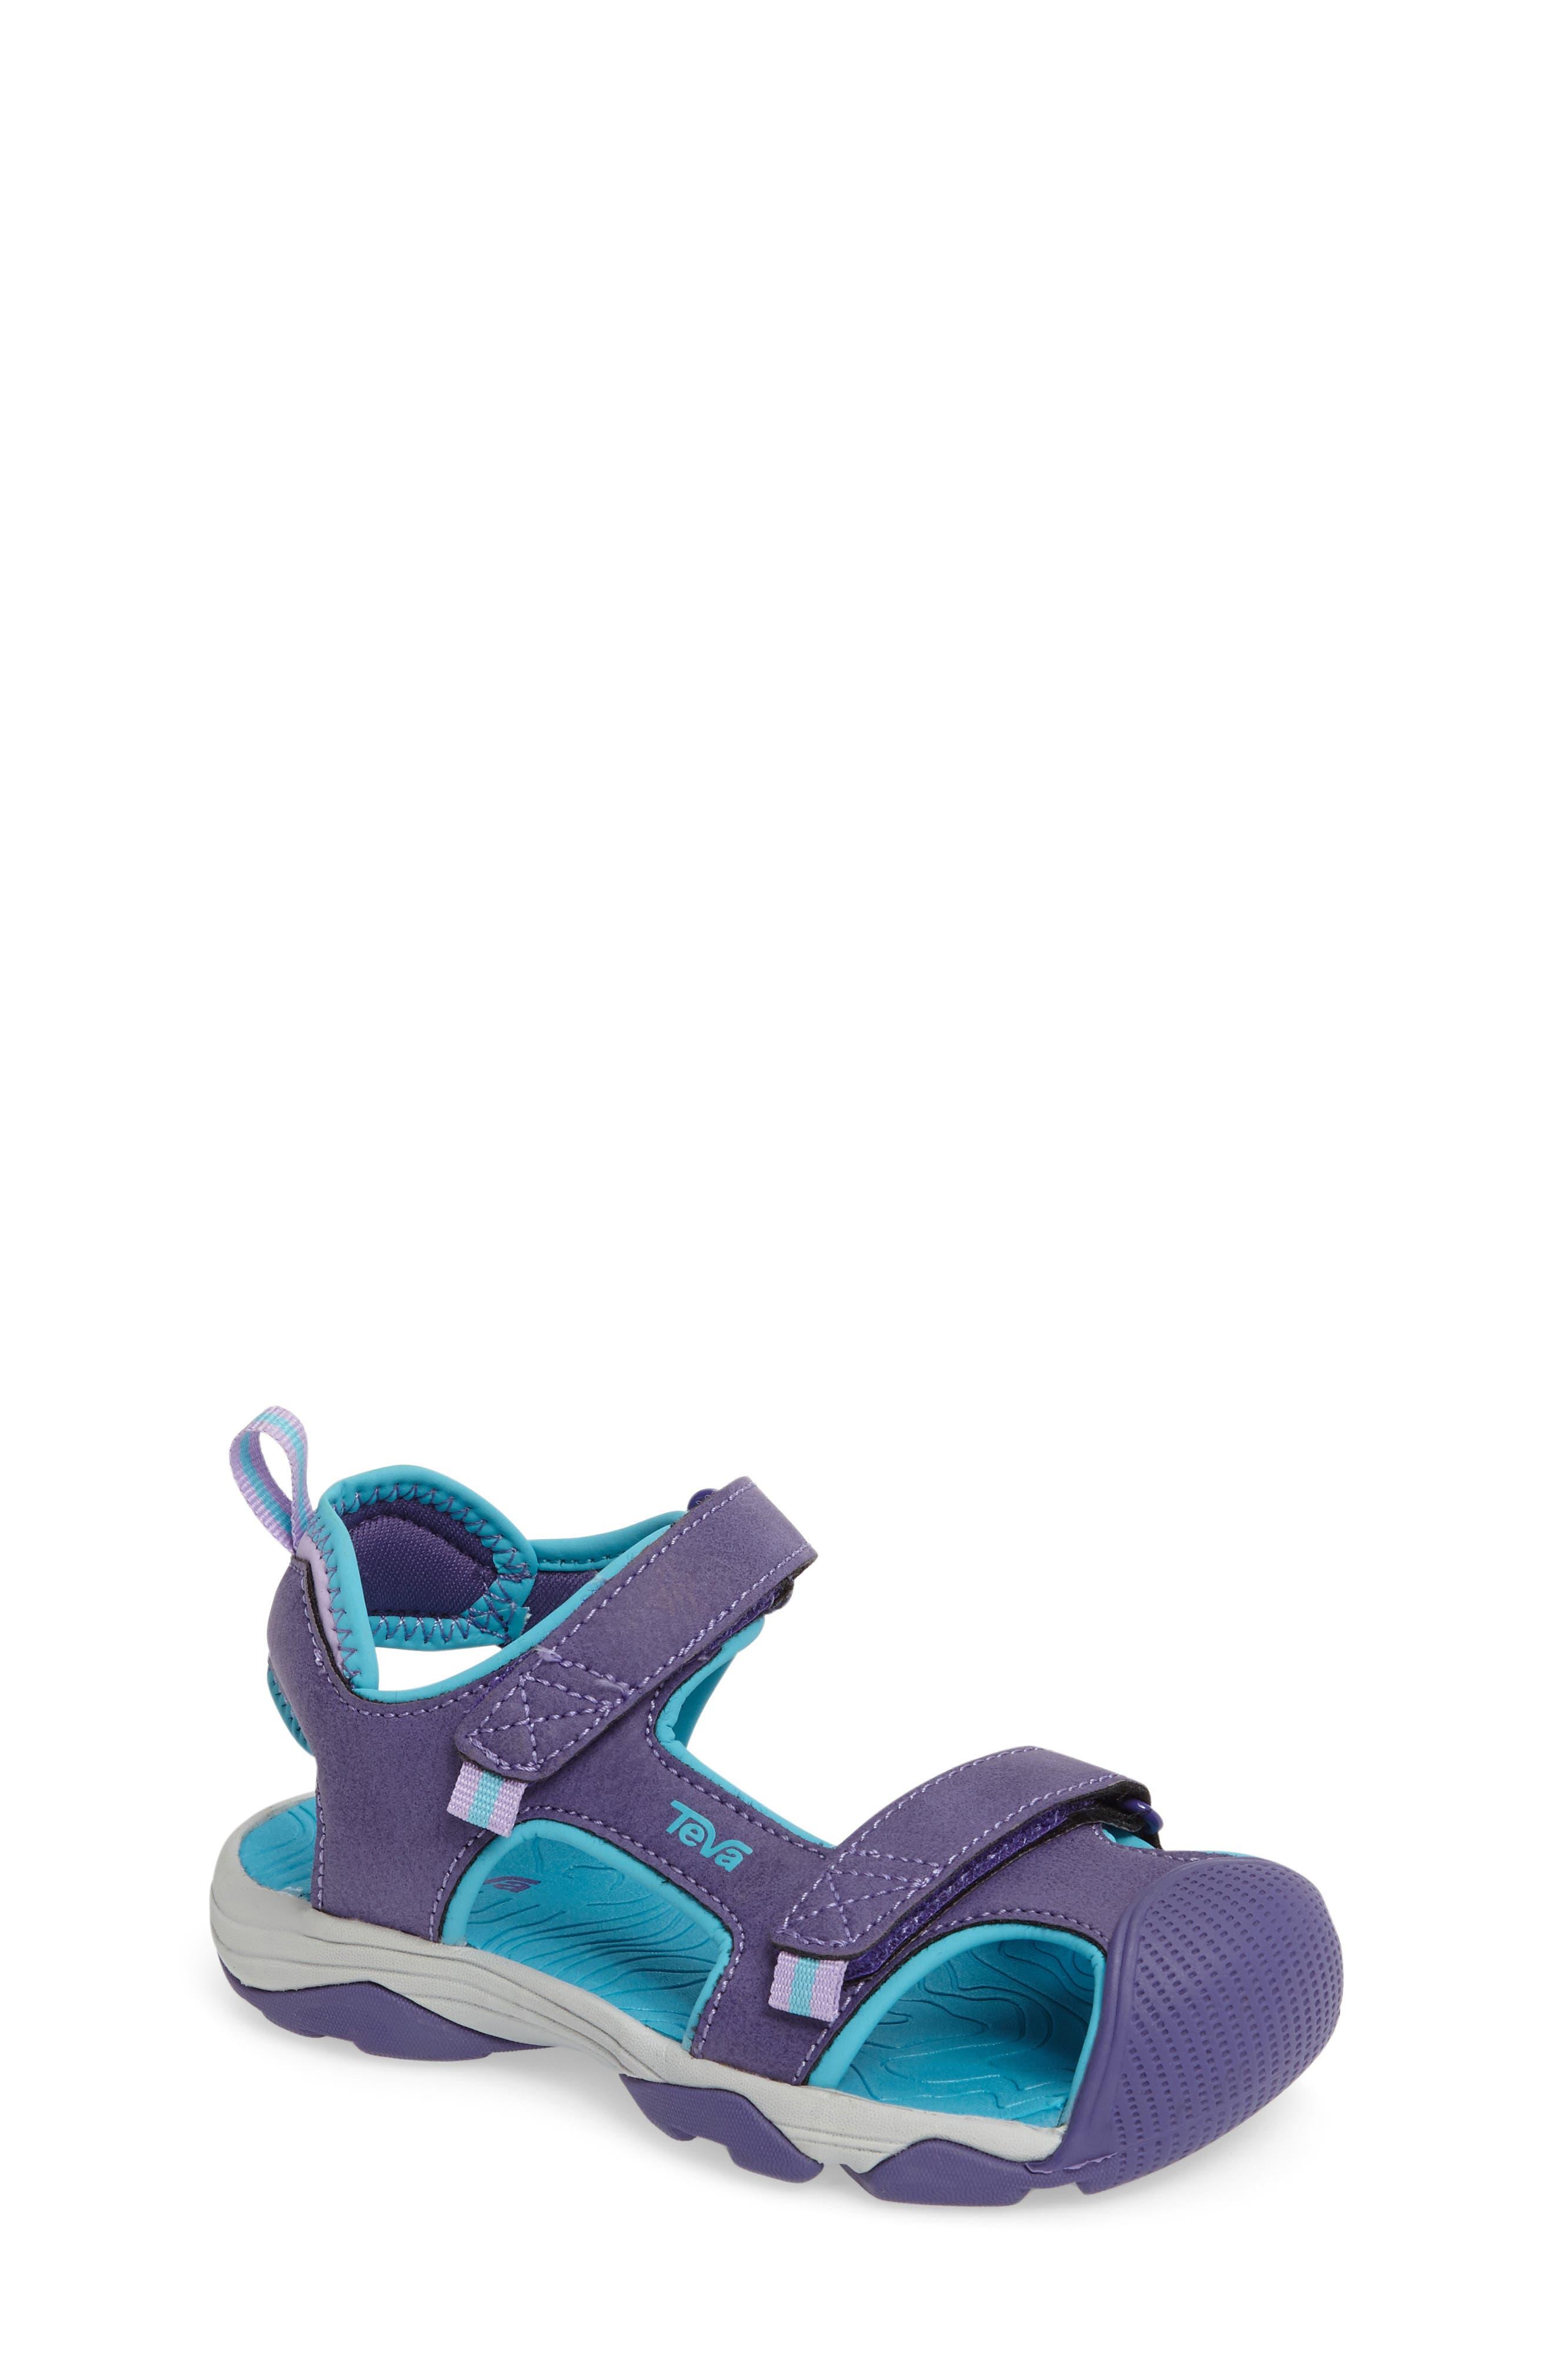 Alternate Image 1 Selected - Teva Toachi 4 Sport Sandal (Toddler, Little Kid & Big Kid)